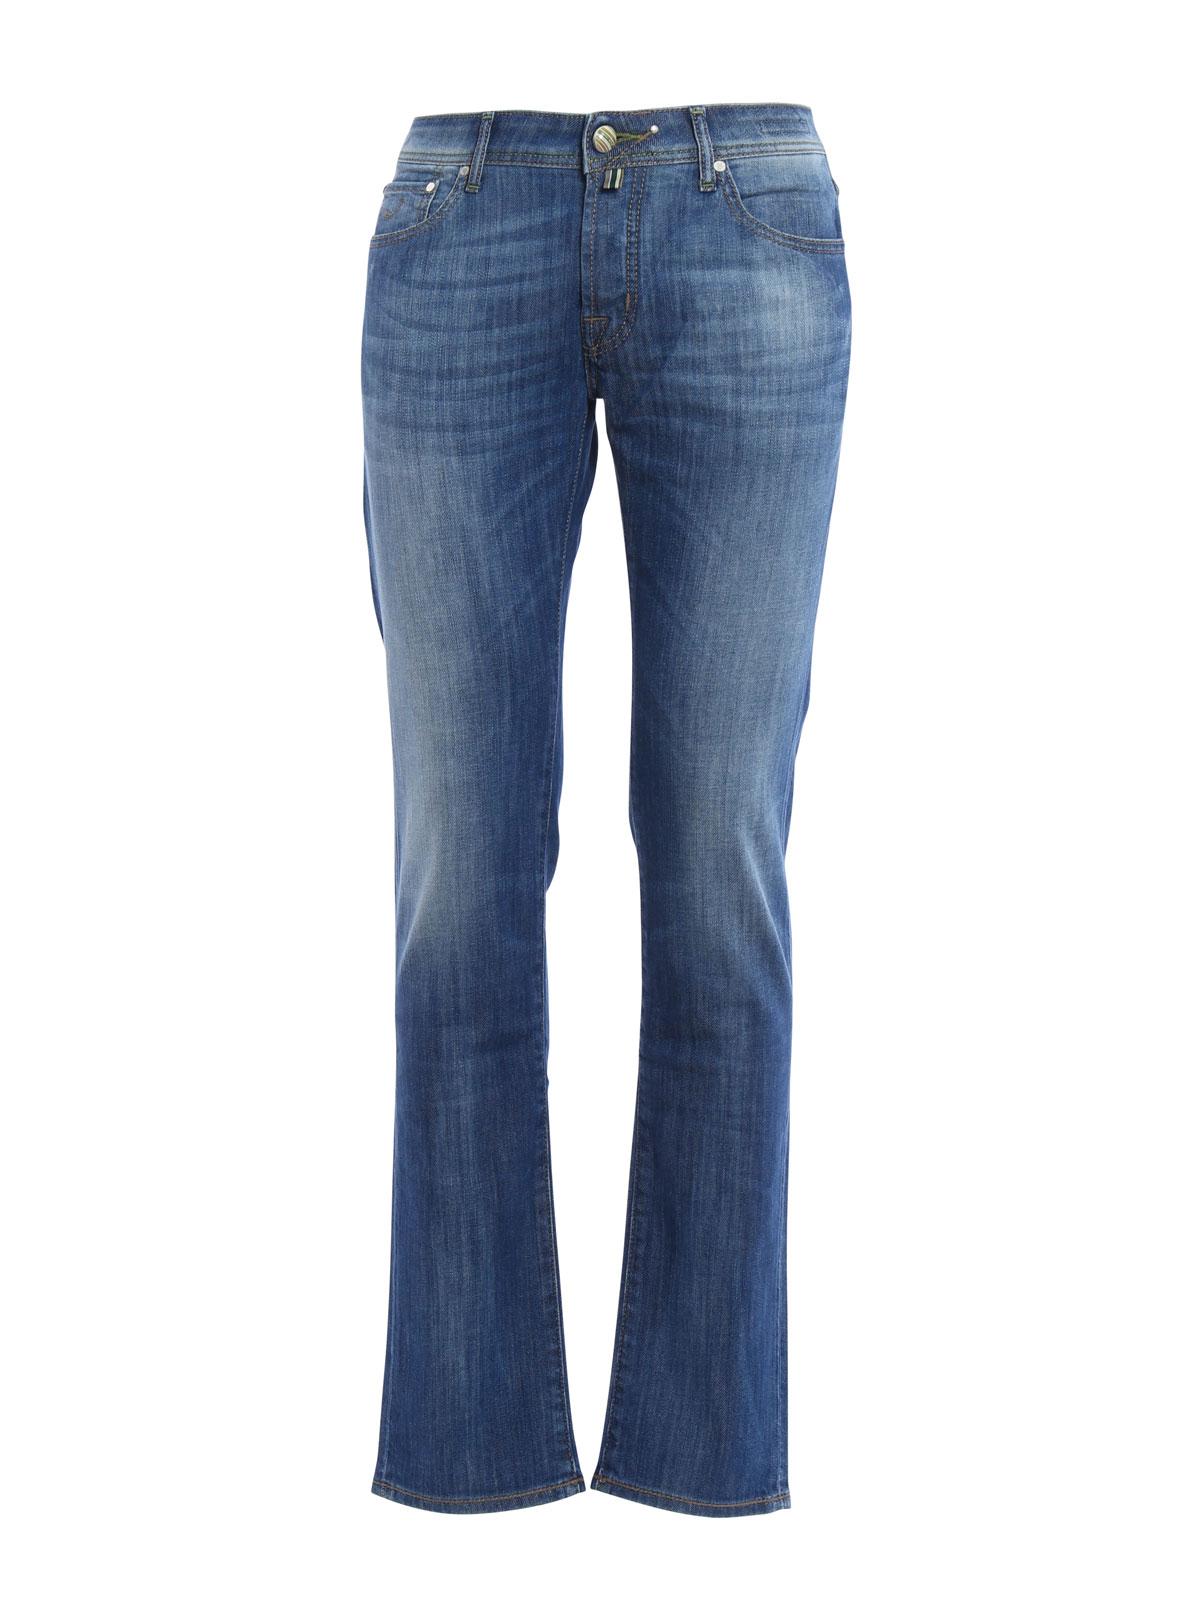 Washed tailored jeans by jacob cohen straight leg jeans - Jacob cohen denim ...